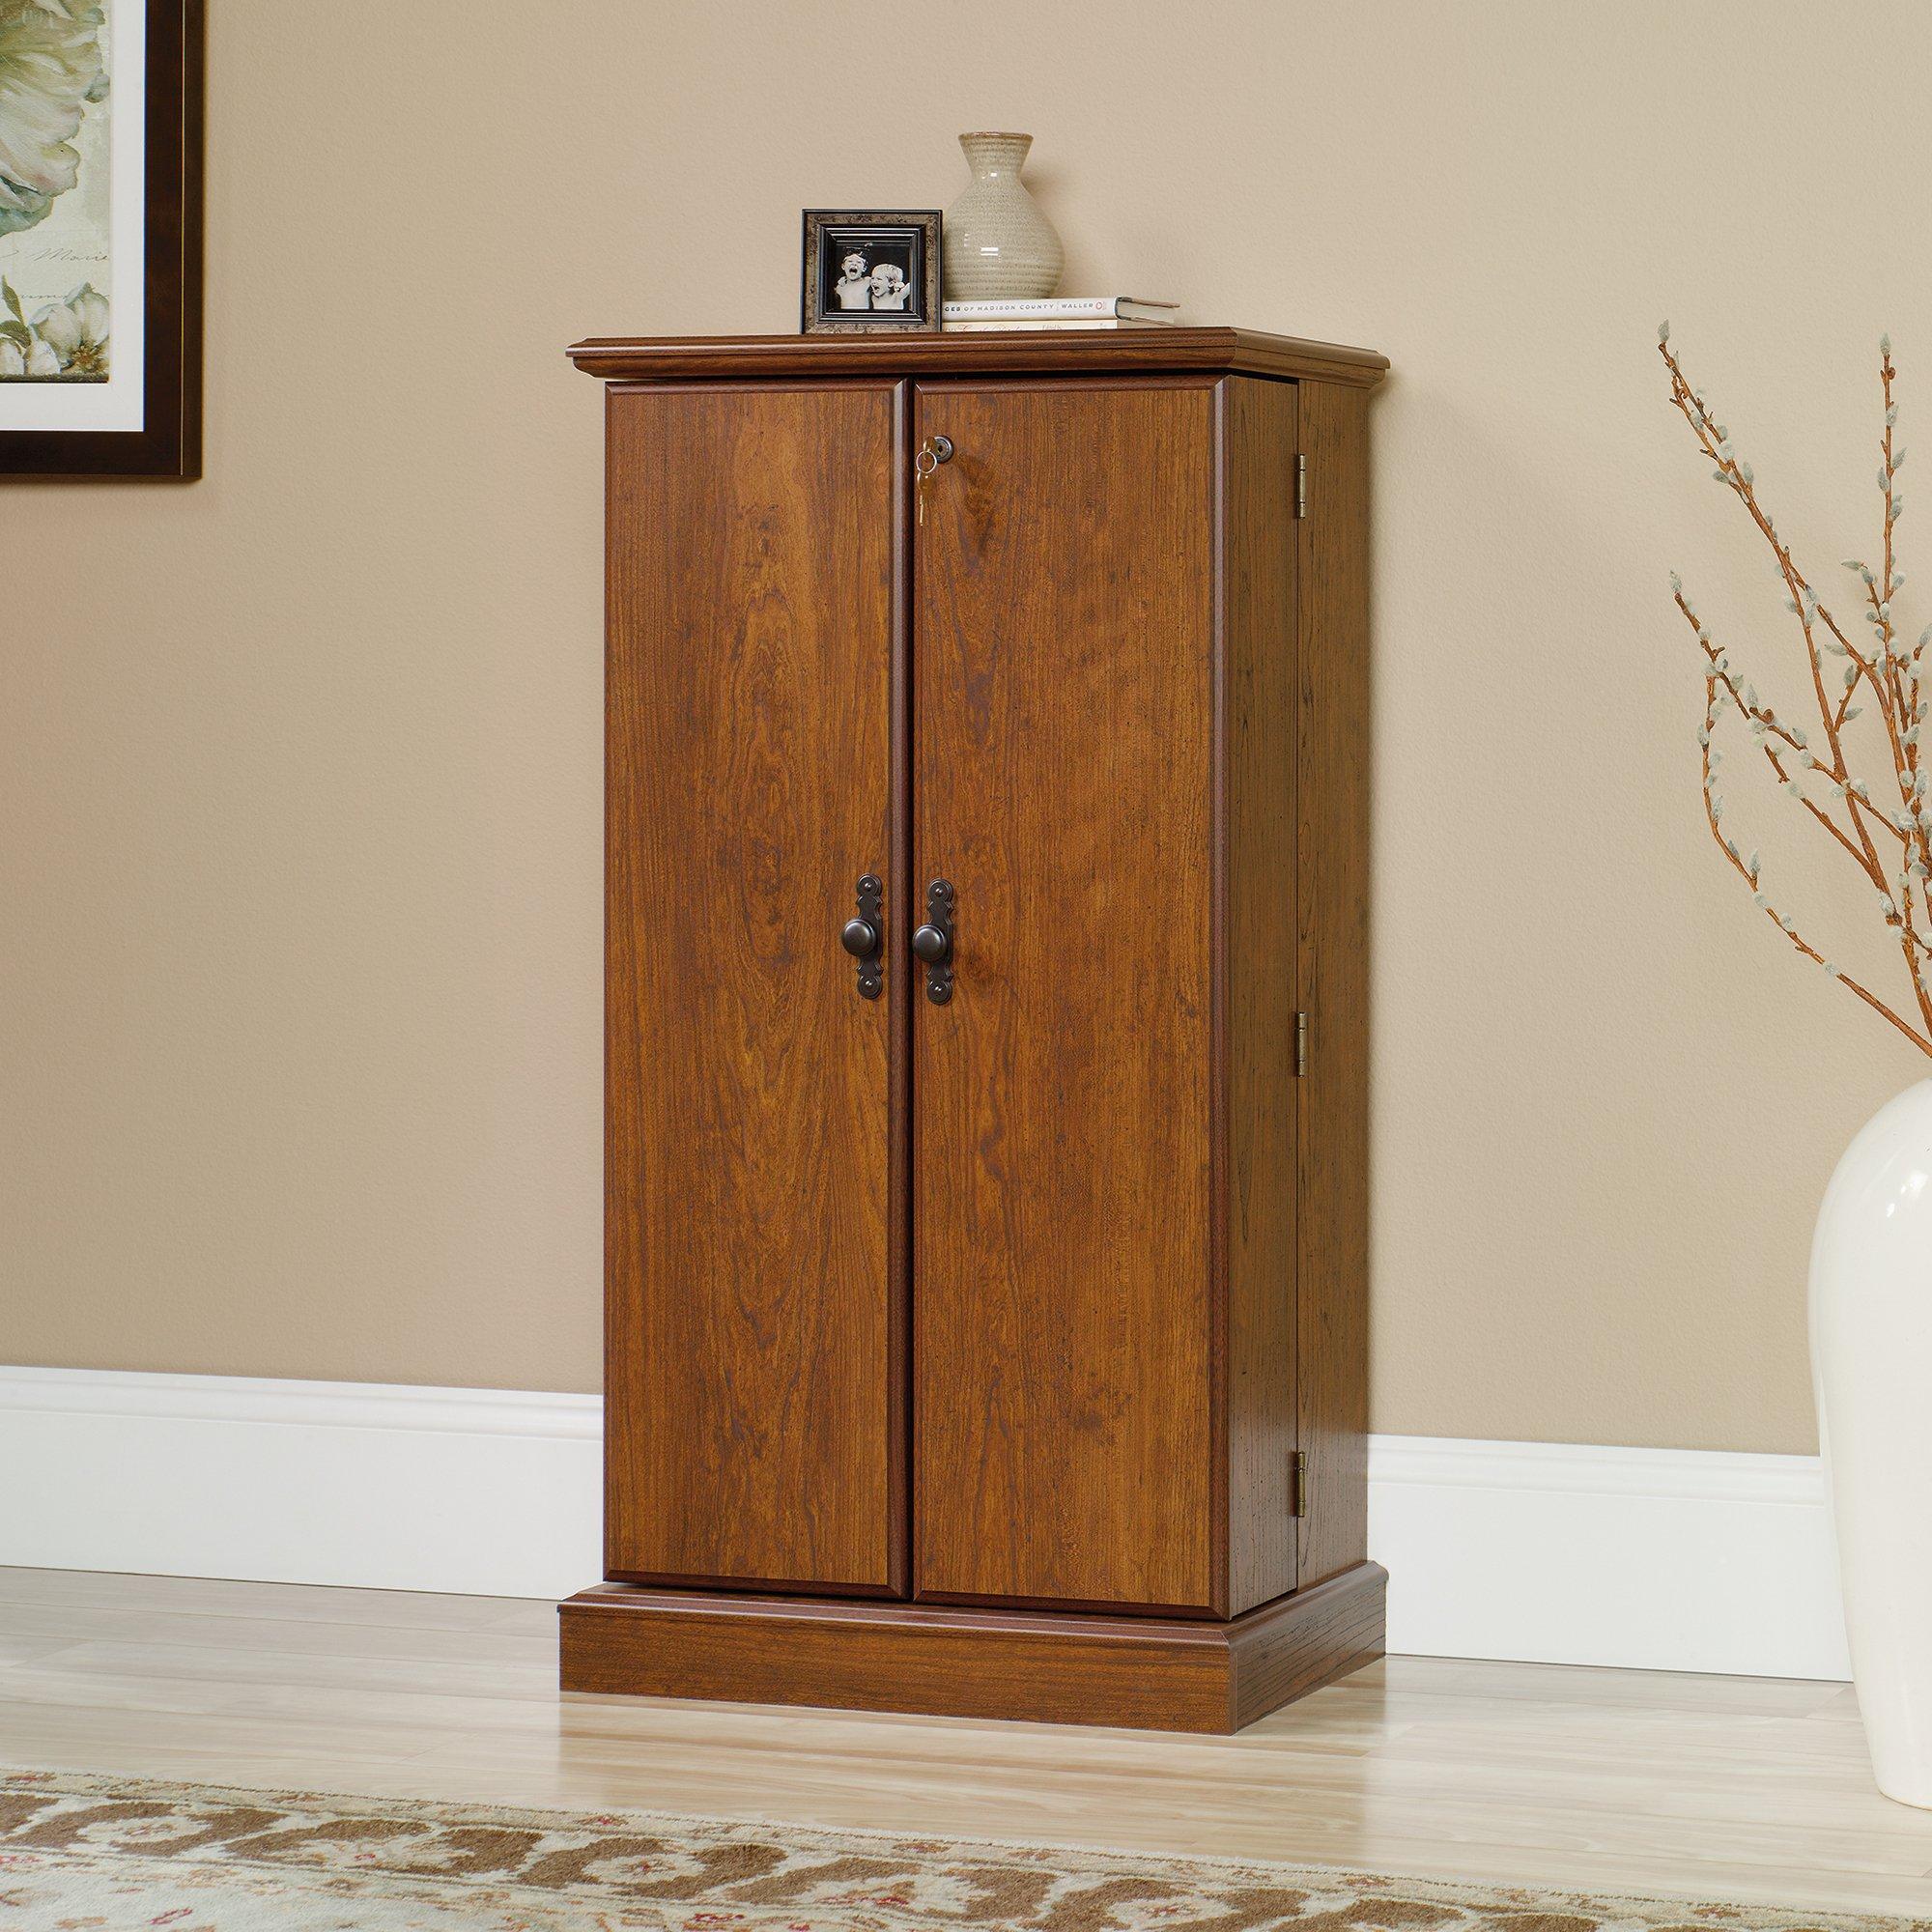 Sauder Orchard Hills Multimedia Storage Cabinet in Milled Cherry